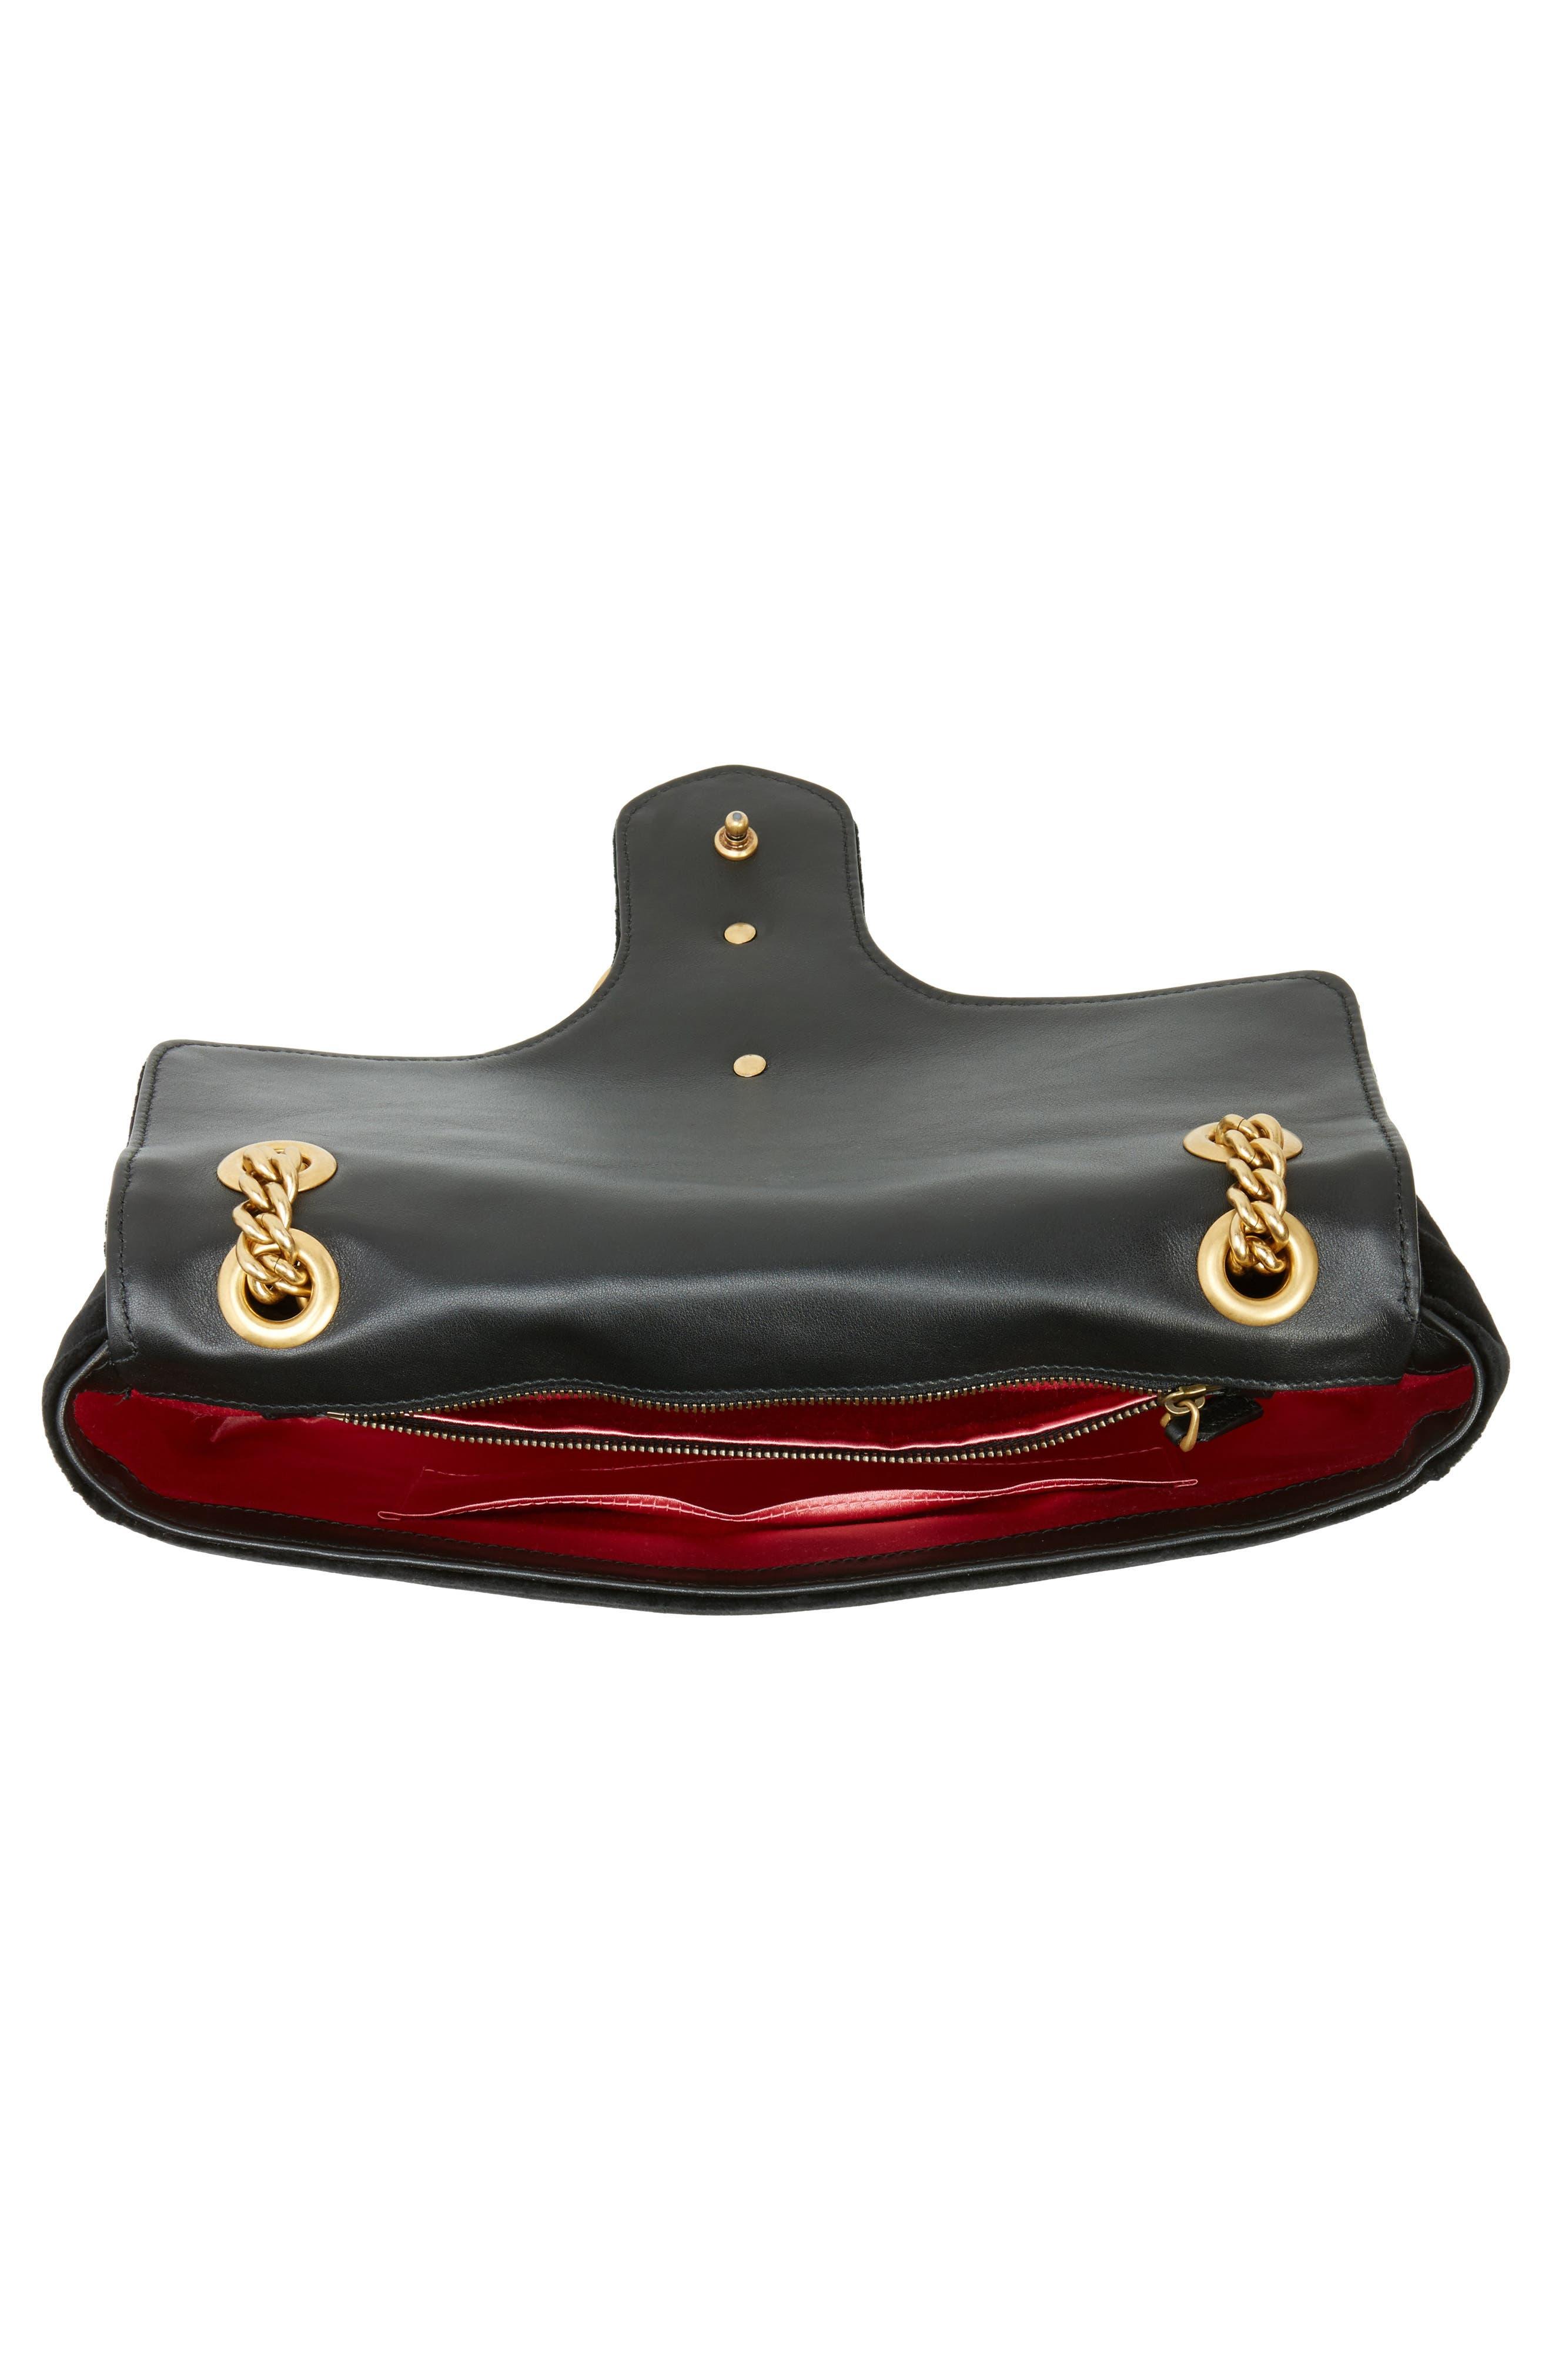 GUCCI, Medium GG Marmont 2.0 Matelassé Velvet Shoulder Bag, Alternate thumbnail 4, color, NERO